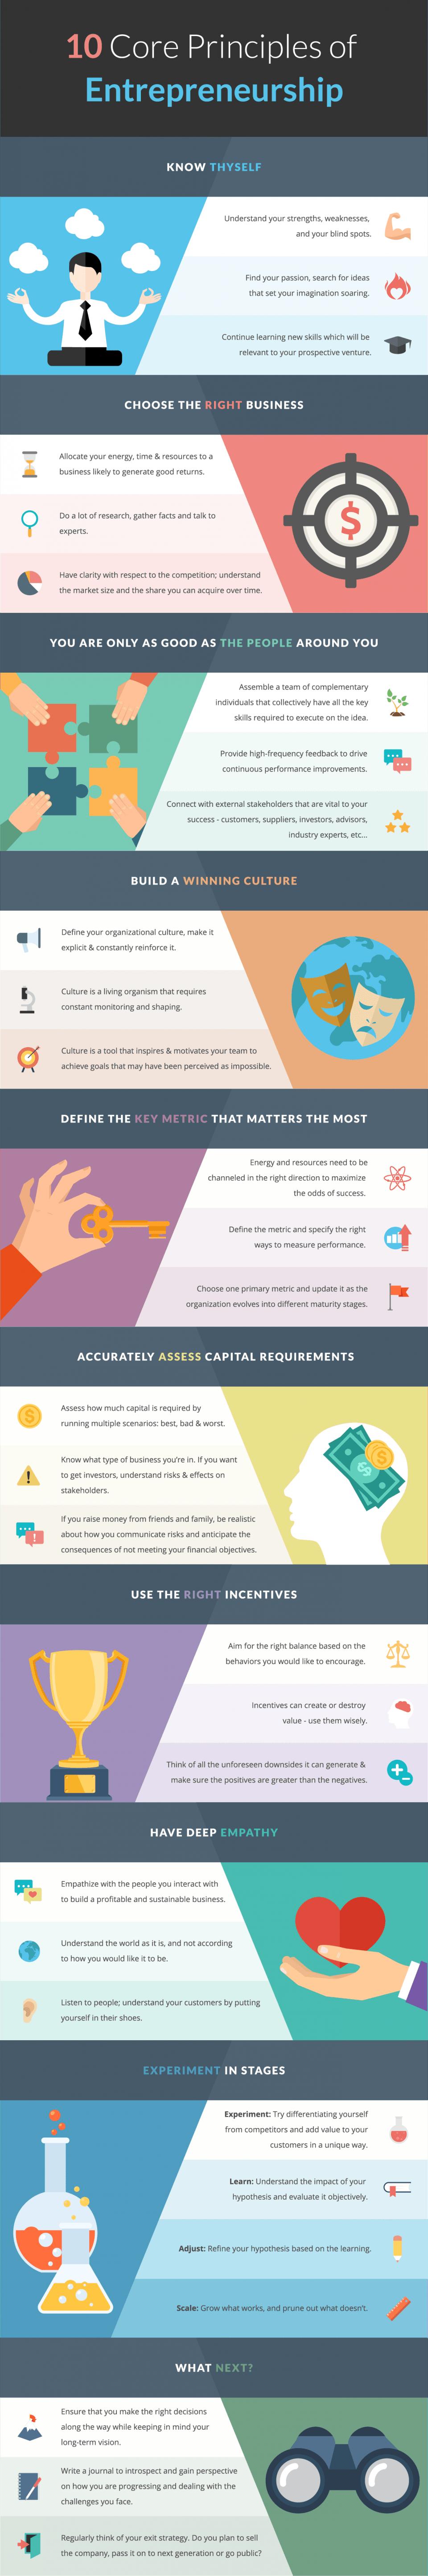 10 Core Principles of Entrepreneurship Infographic